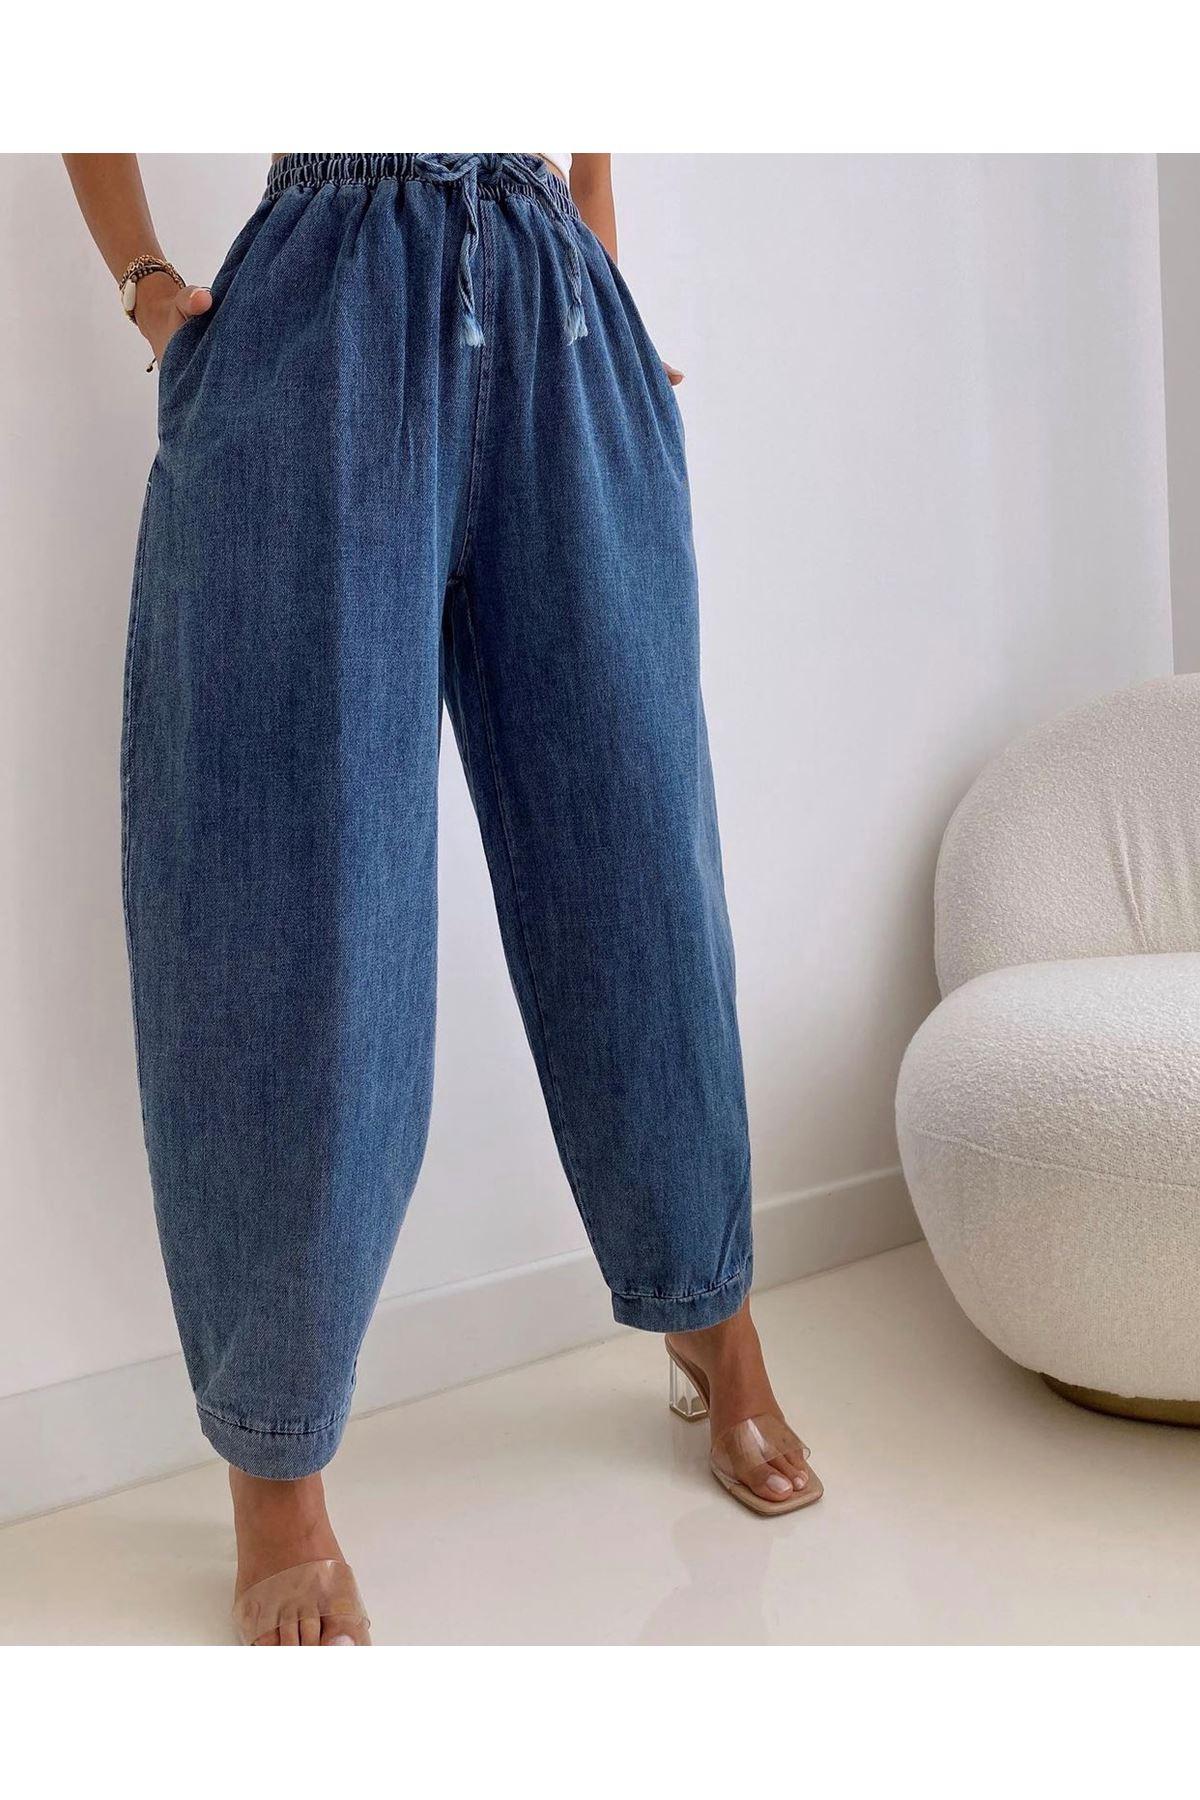 Denim Şalvar Model Pantolon